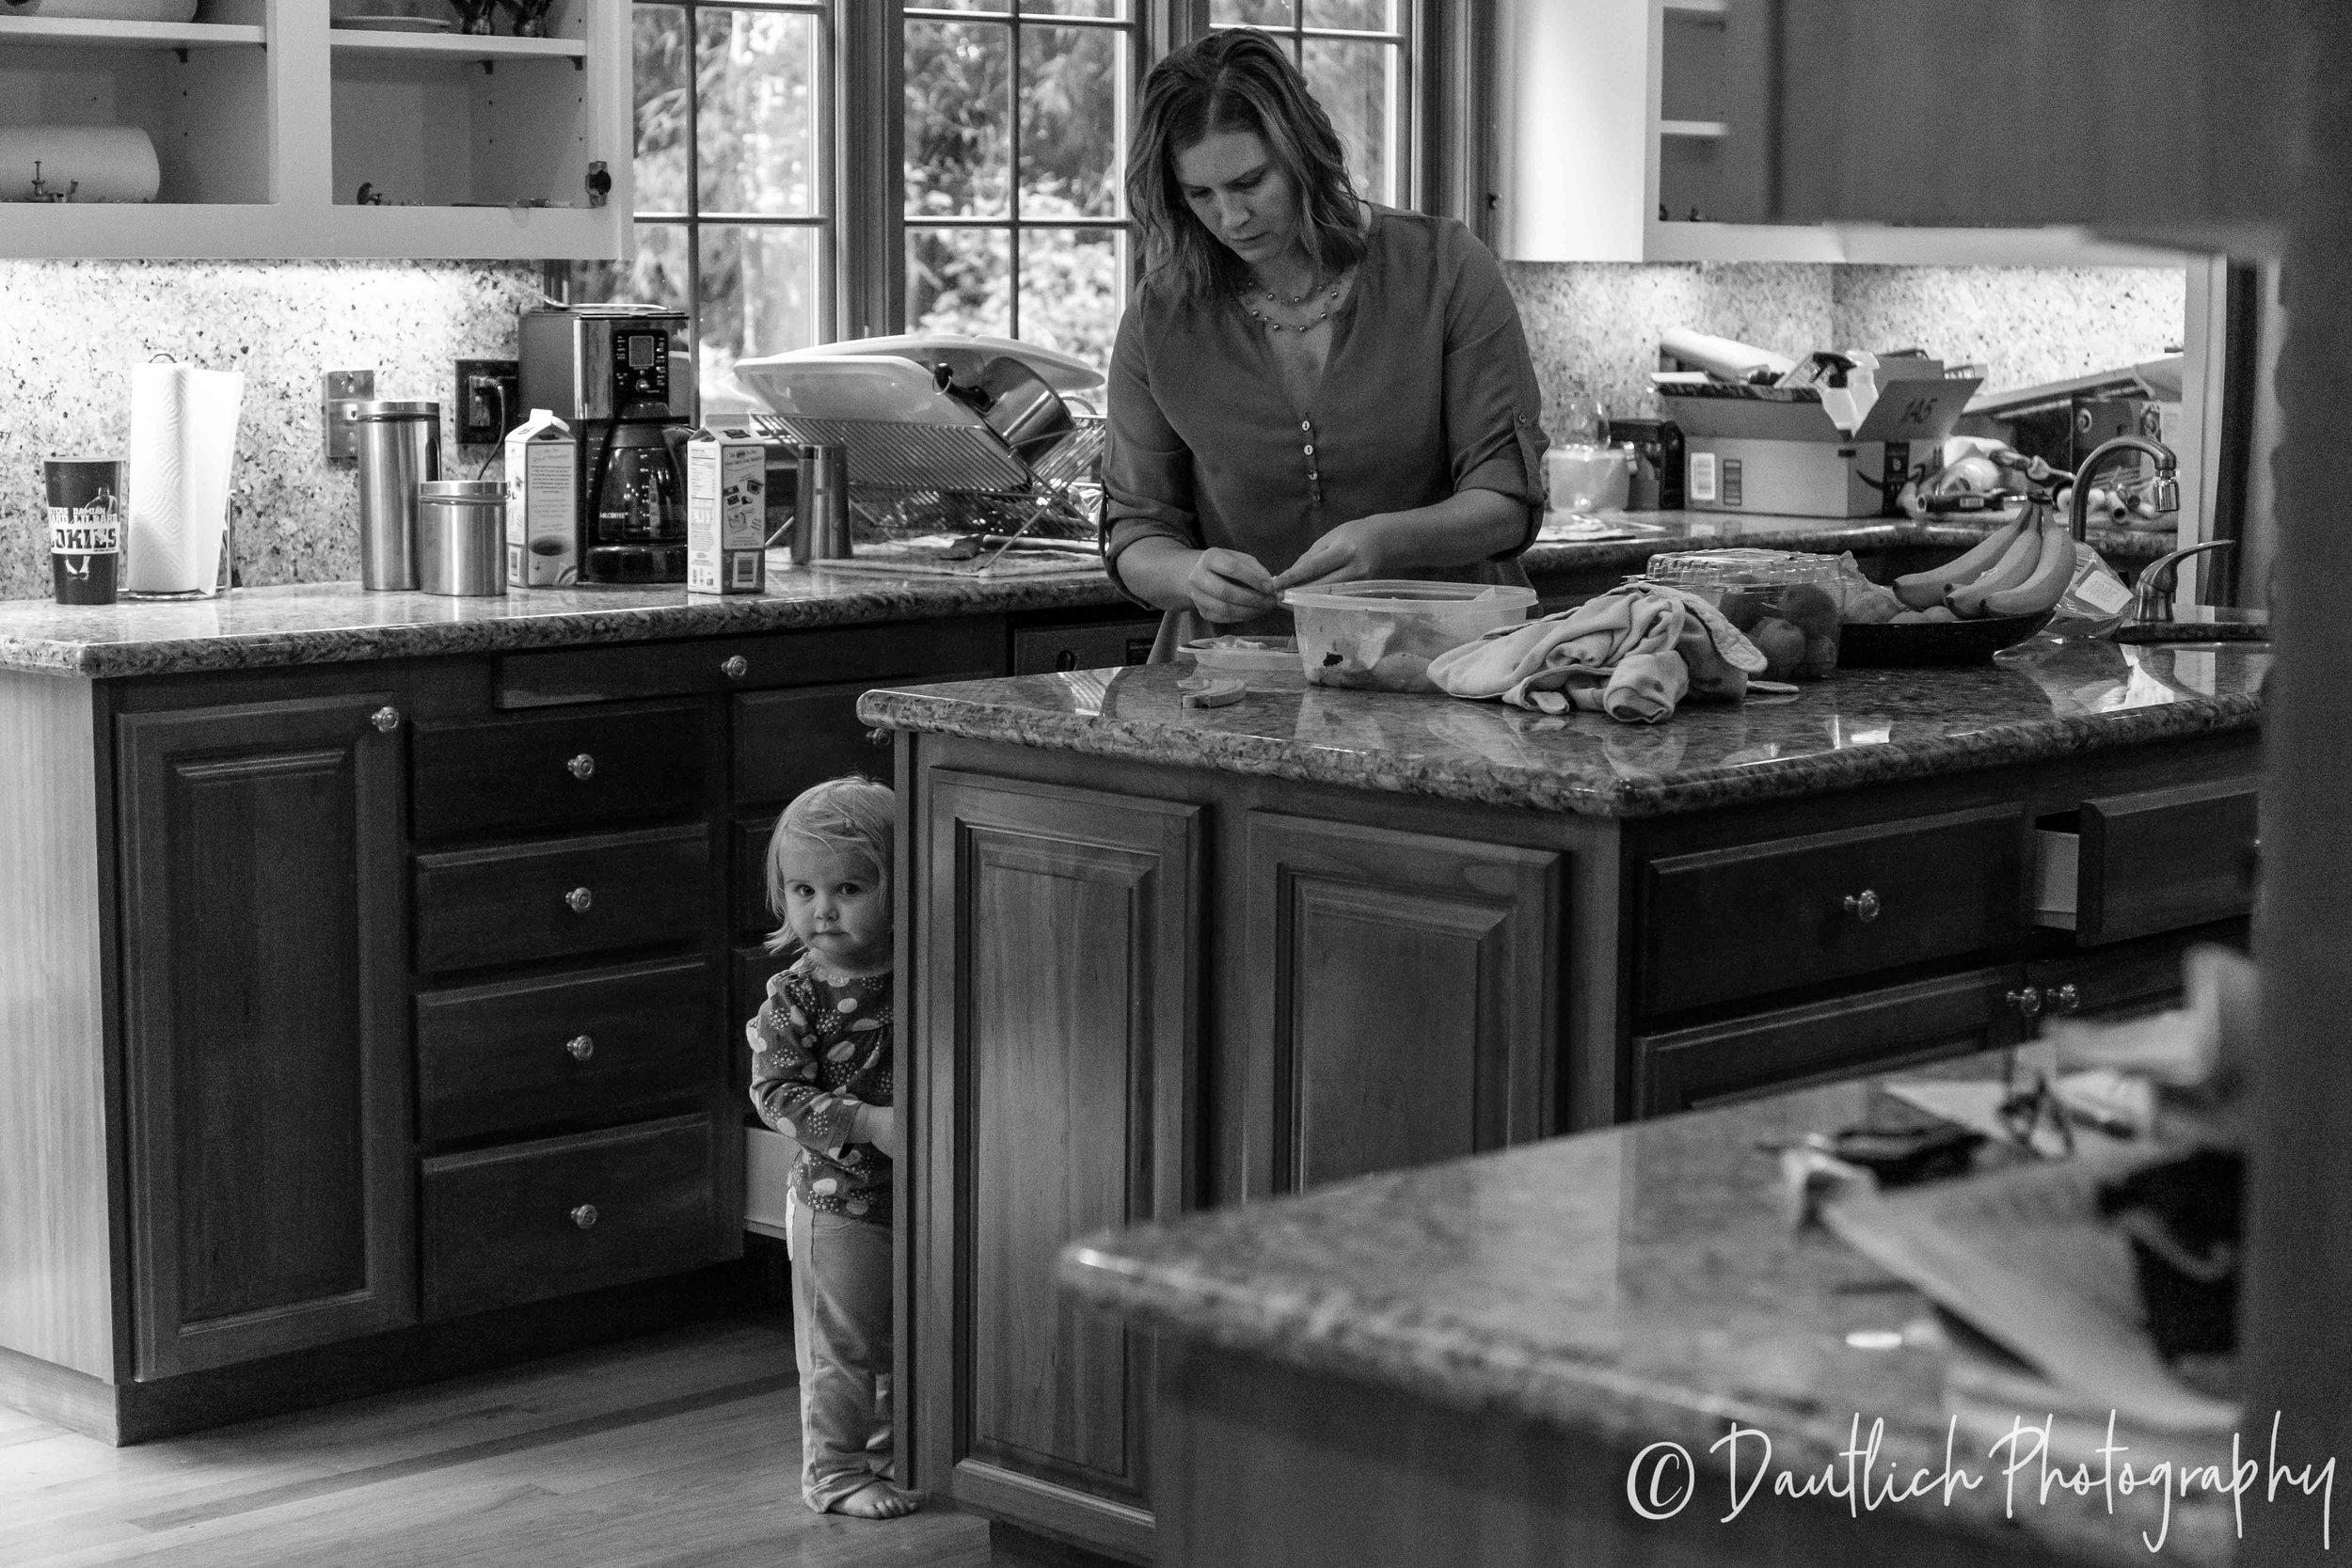 Aina peeking around the corner from the kitchen island as mom prepares some snacks.